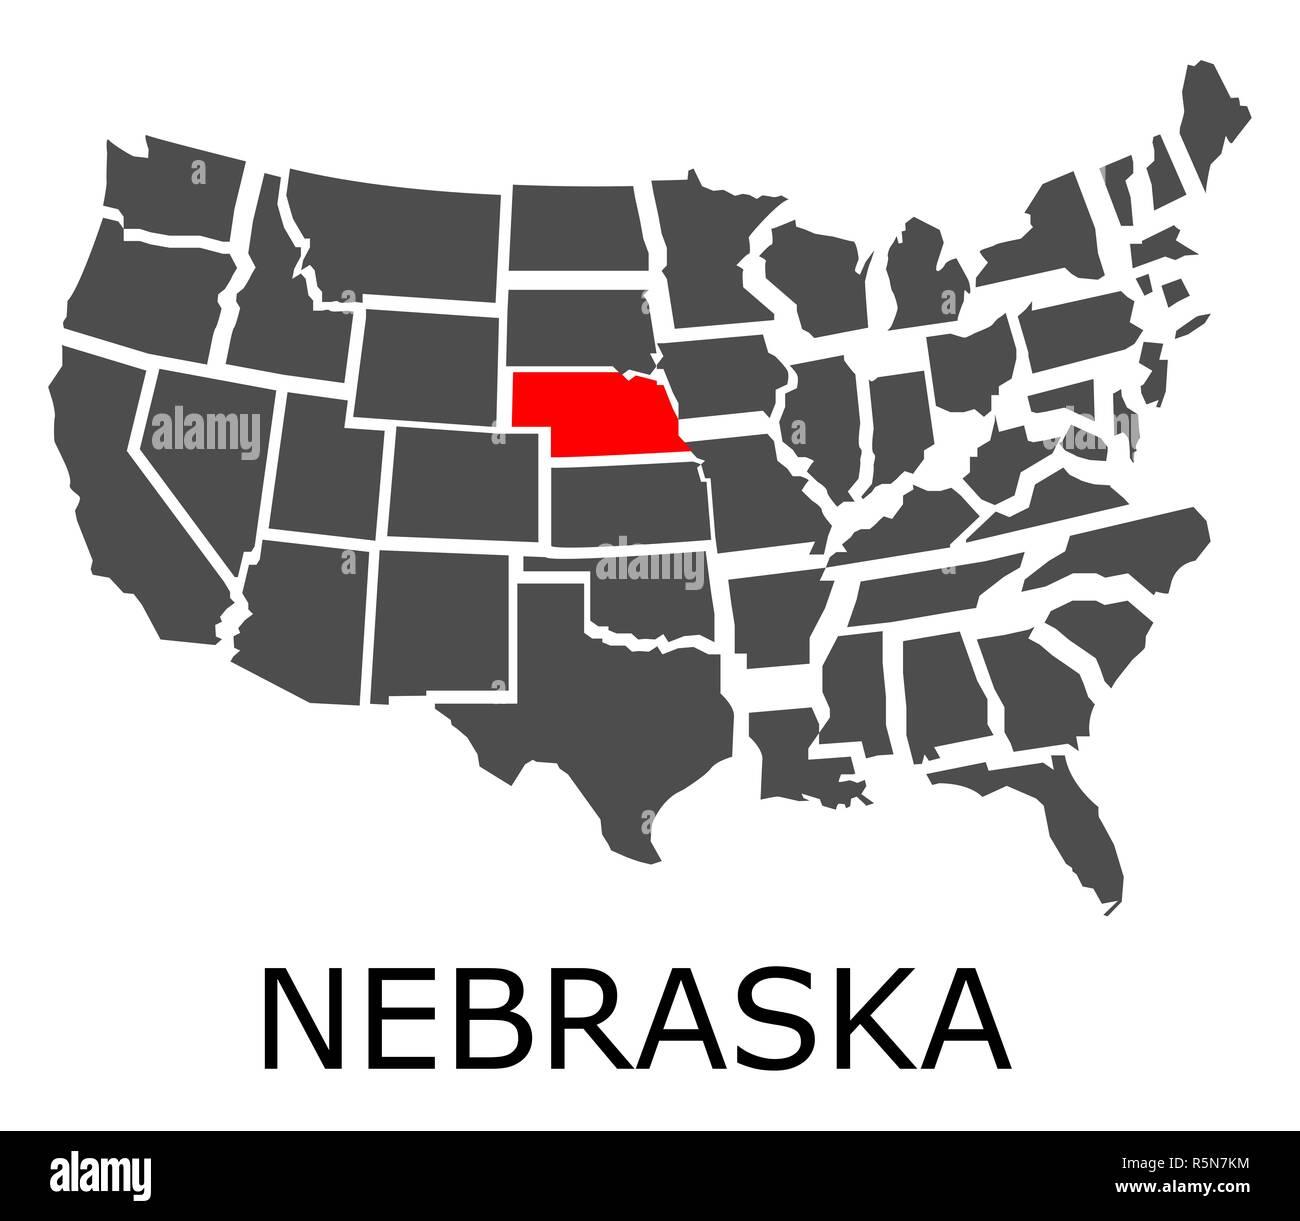 State Of Nebraska On Map Of Usa Stock Photo 227275096 Alamy